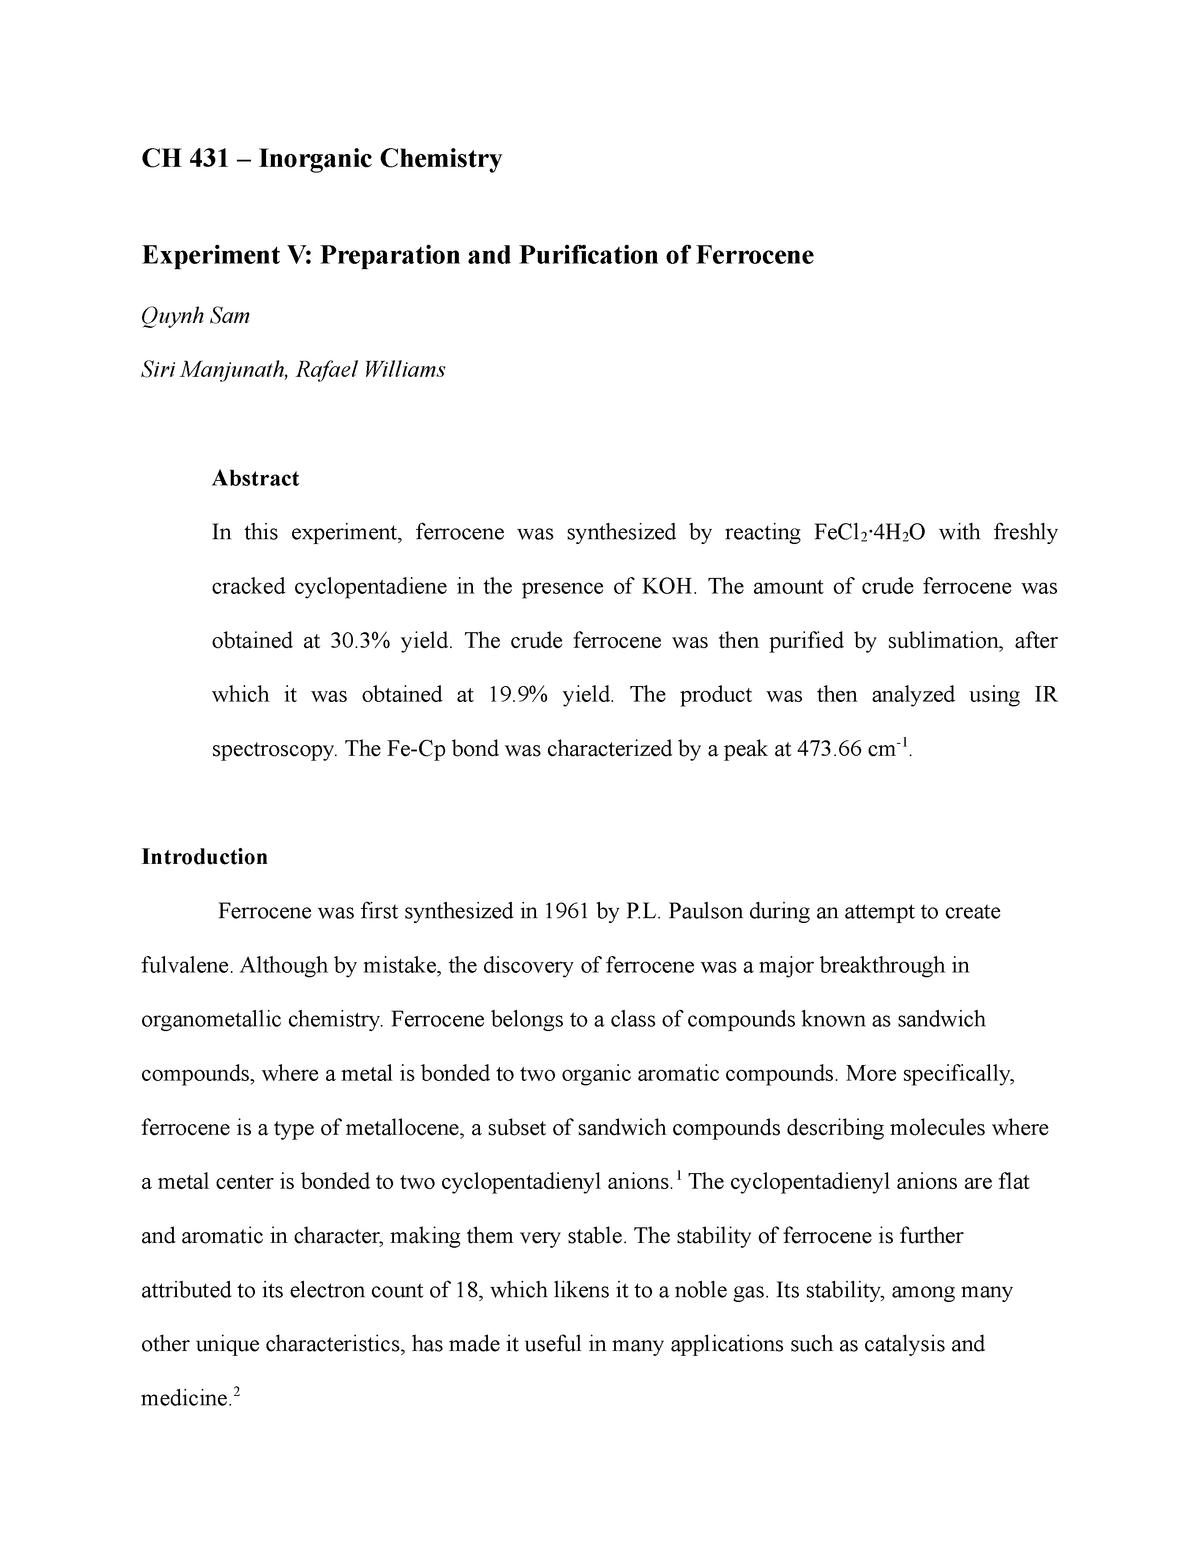 Seminar Assignments - Report For Ferrocene Lab - CH 455